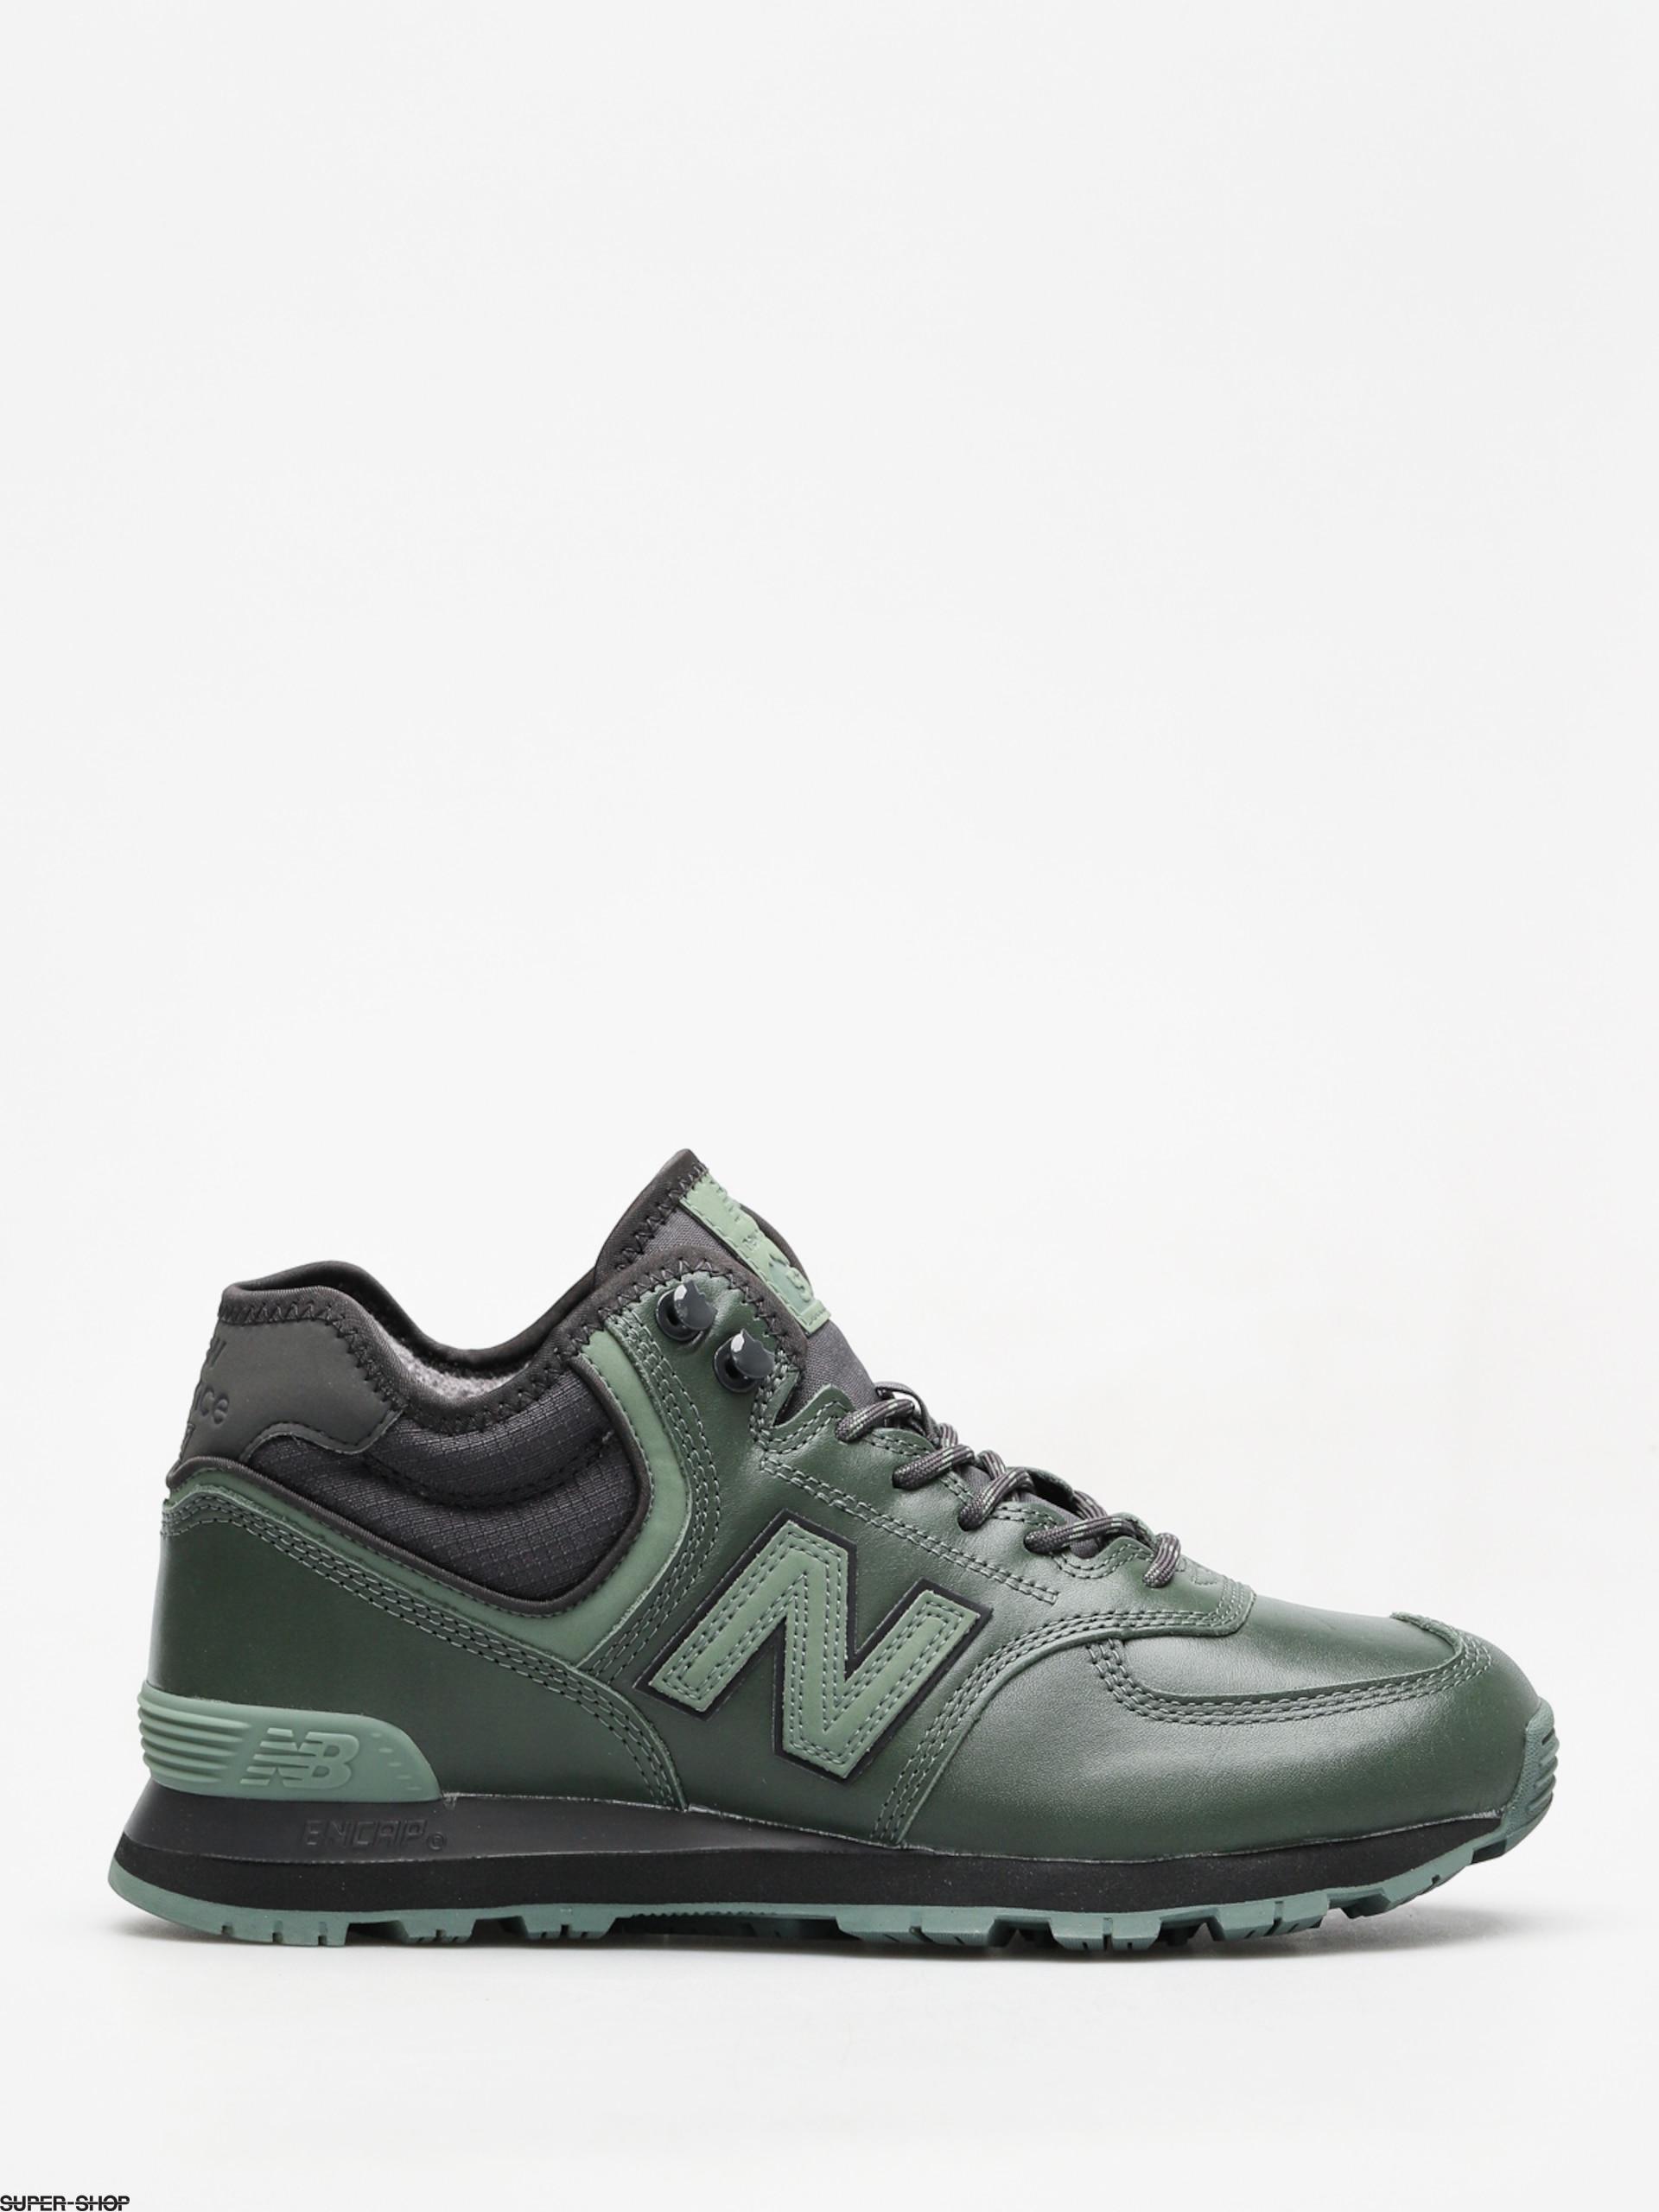 new arrival 2c0ea 4d073 New Balance Shoes 574 (vintage cedar)